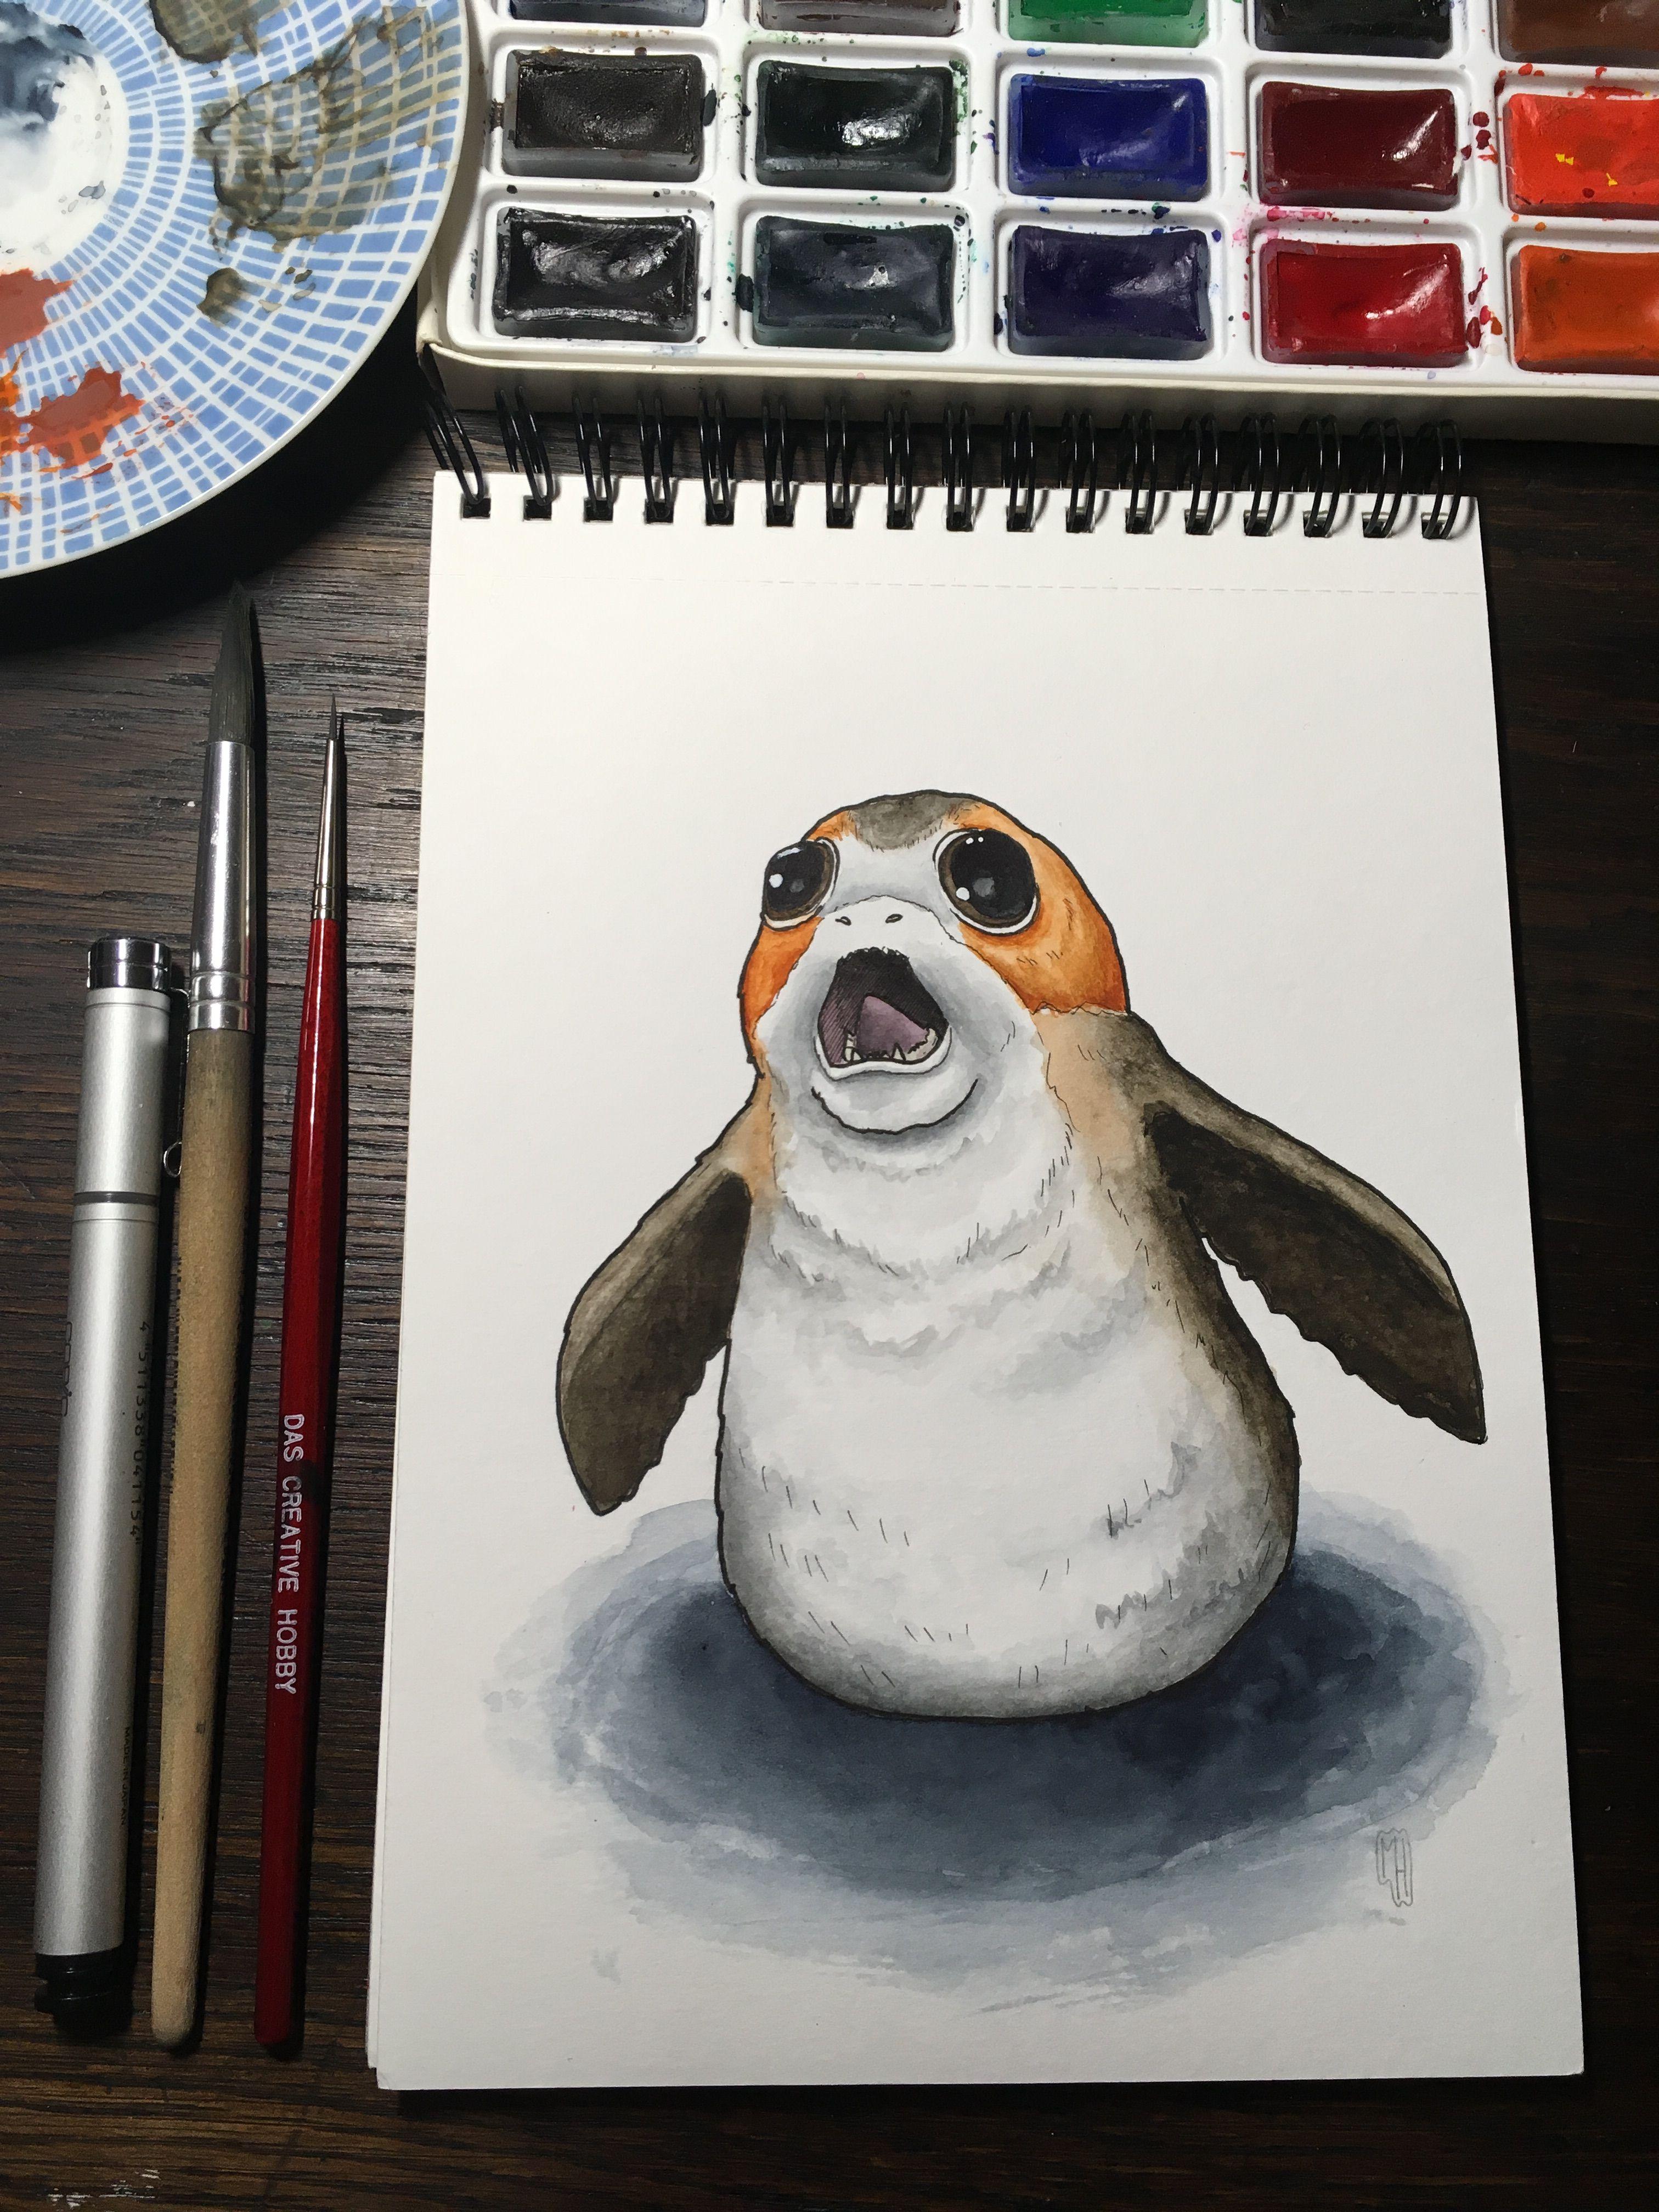 Star Wars Last Jedi Porg